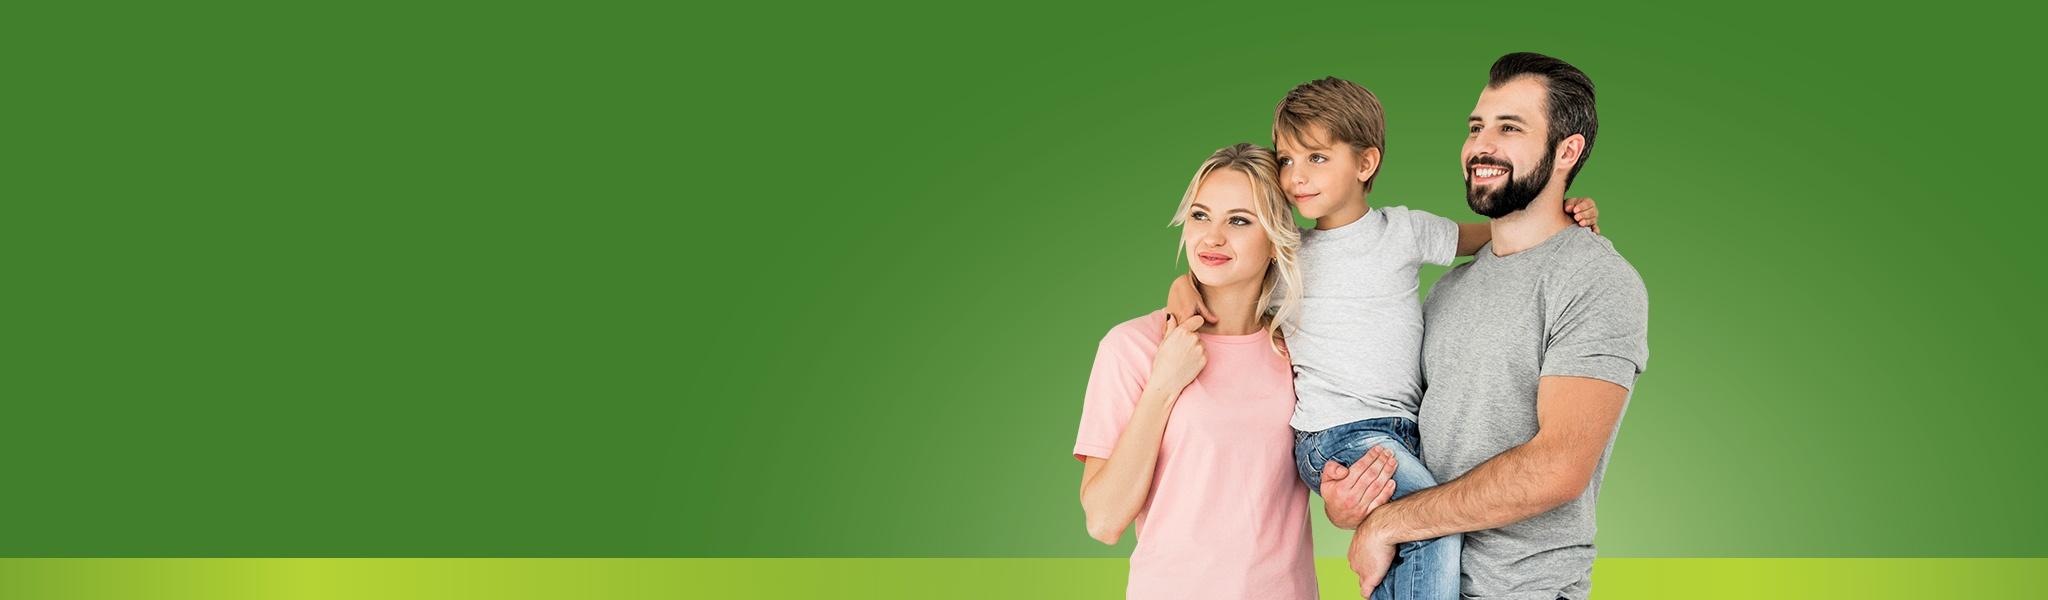 hero-green-new-family